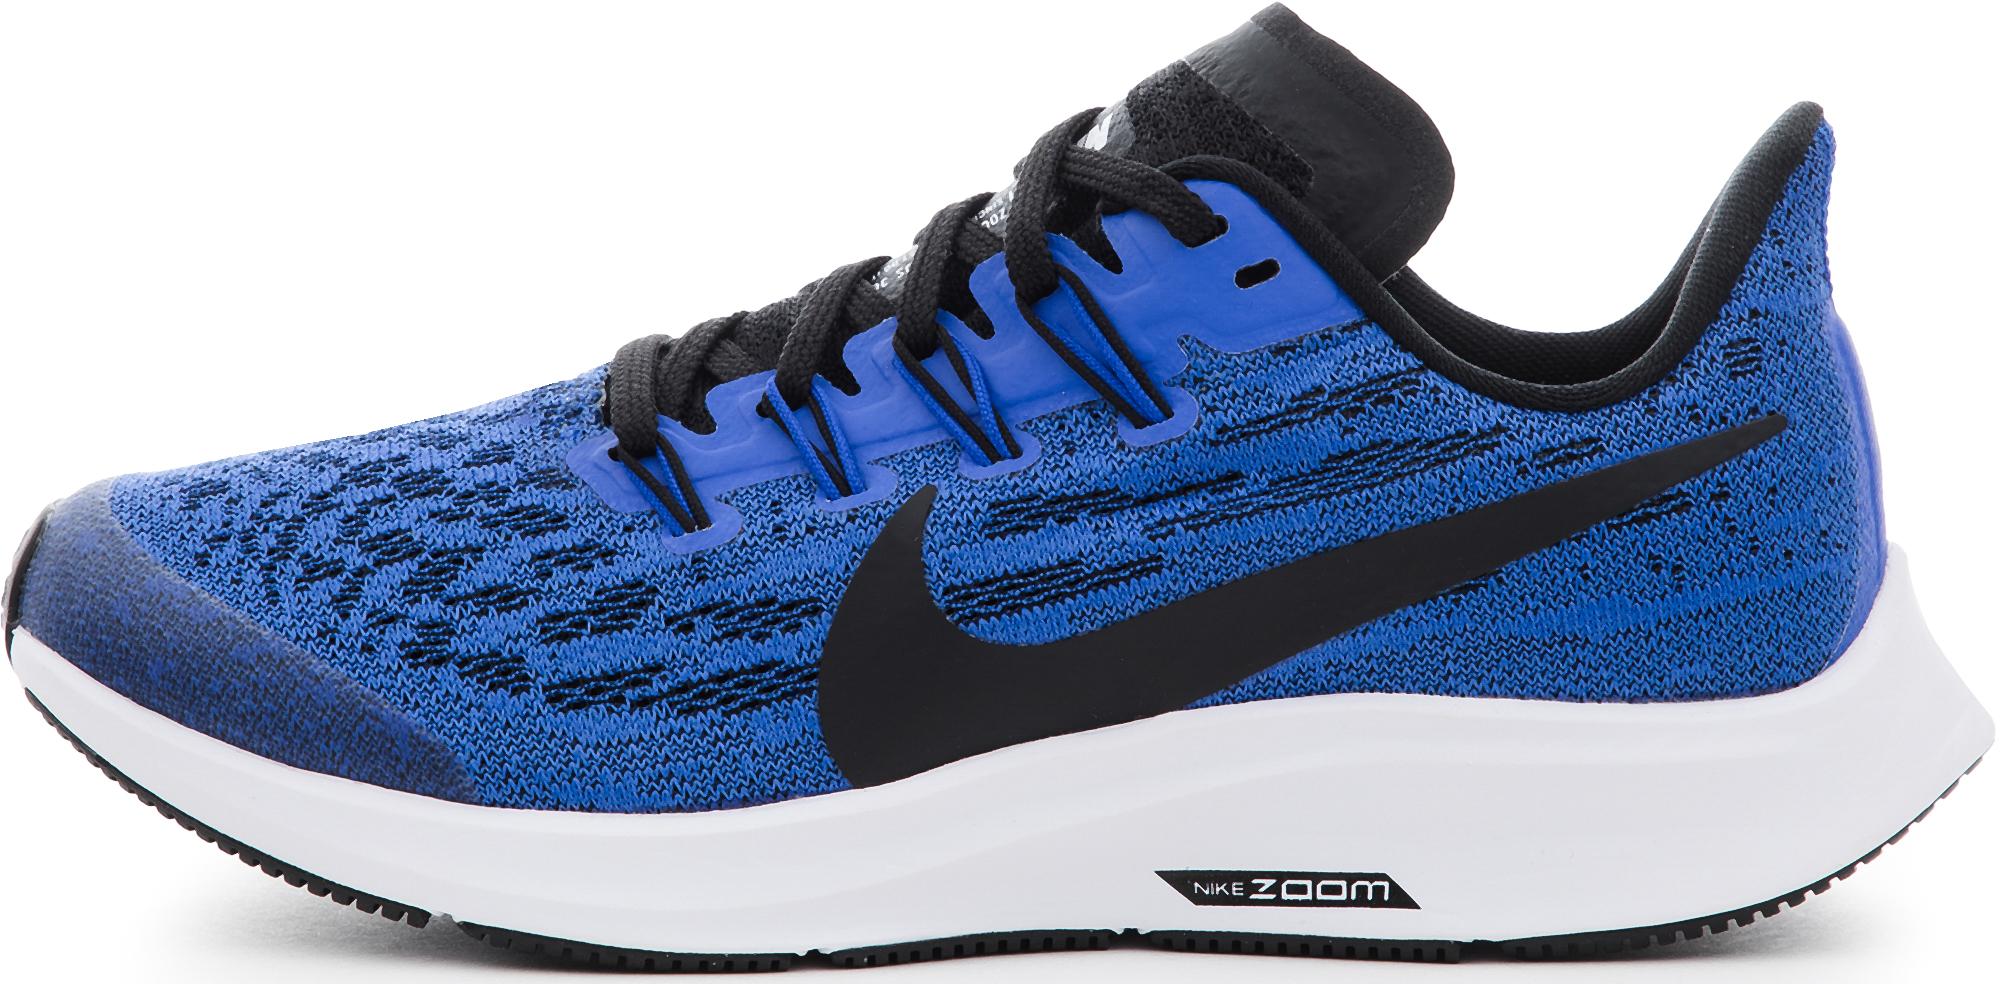 Nike Кроссовки для мальчиков Air Zoom Pegasus 36, размер 39